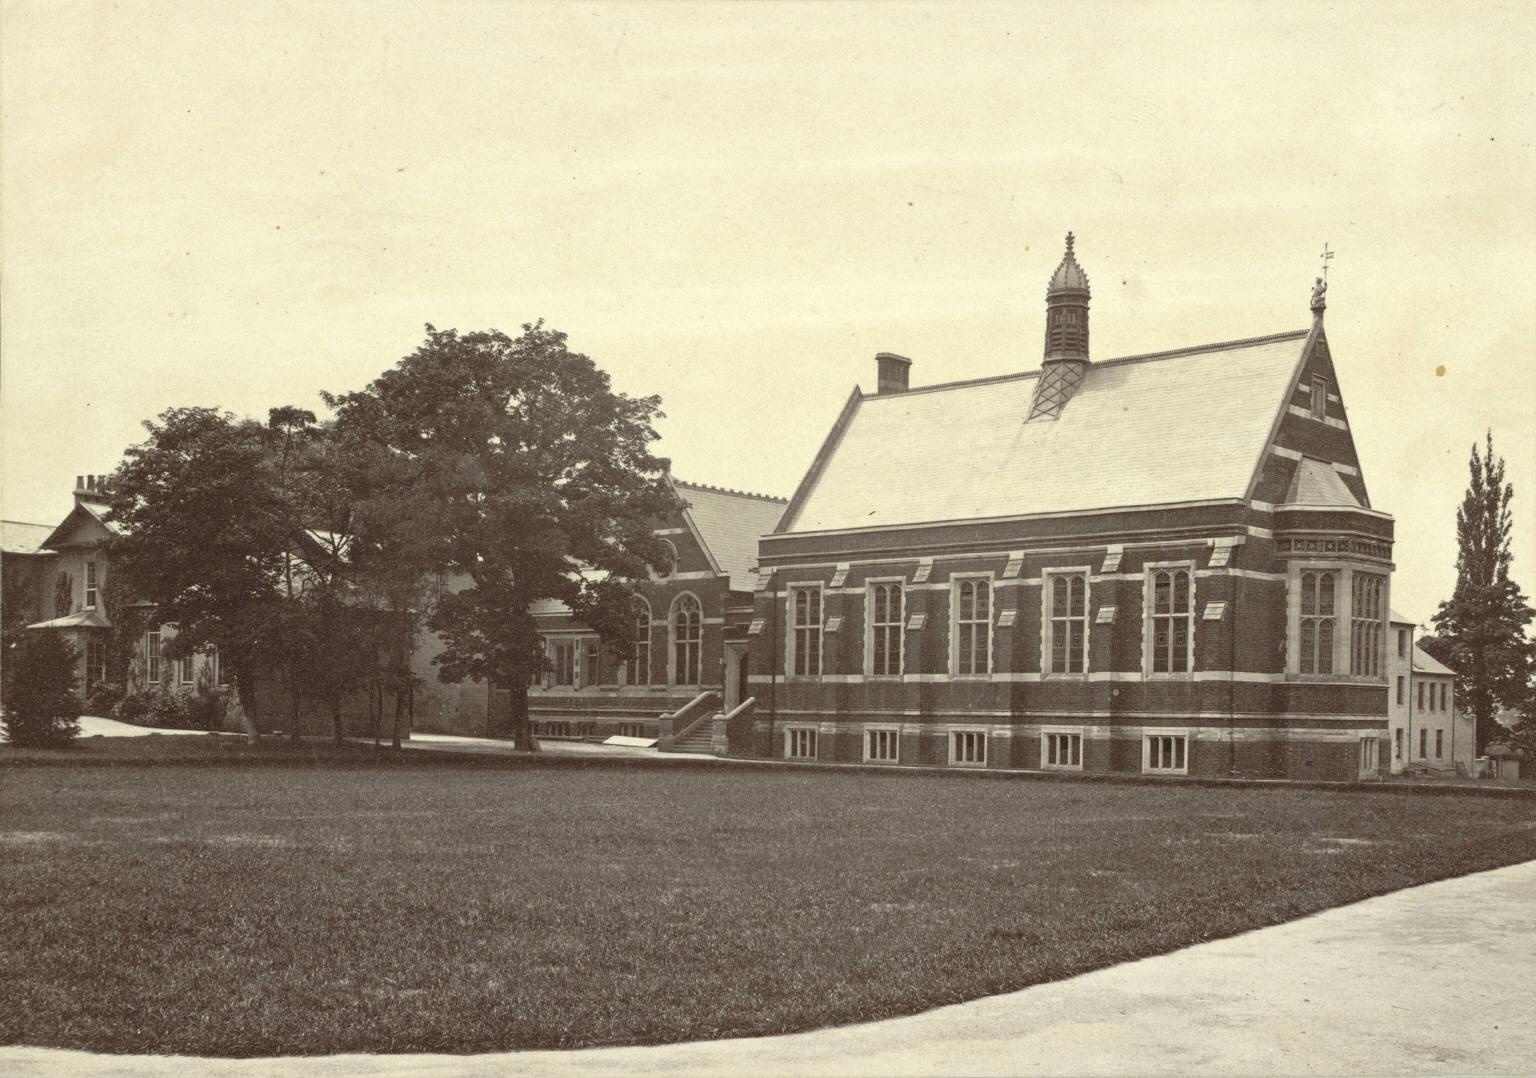 Hall, The Leys School, Cambridge